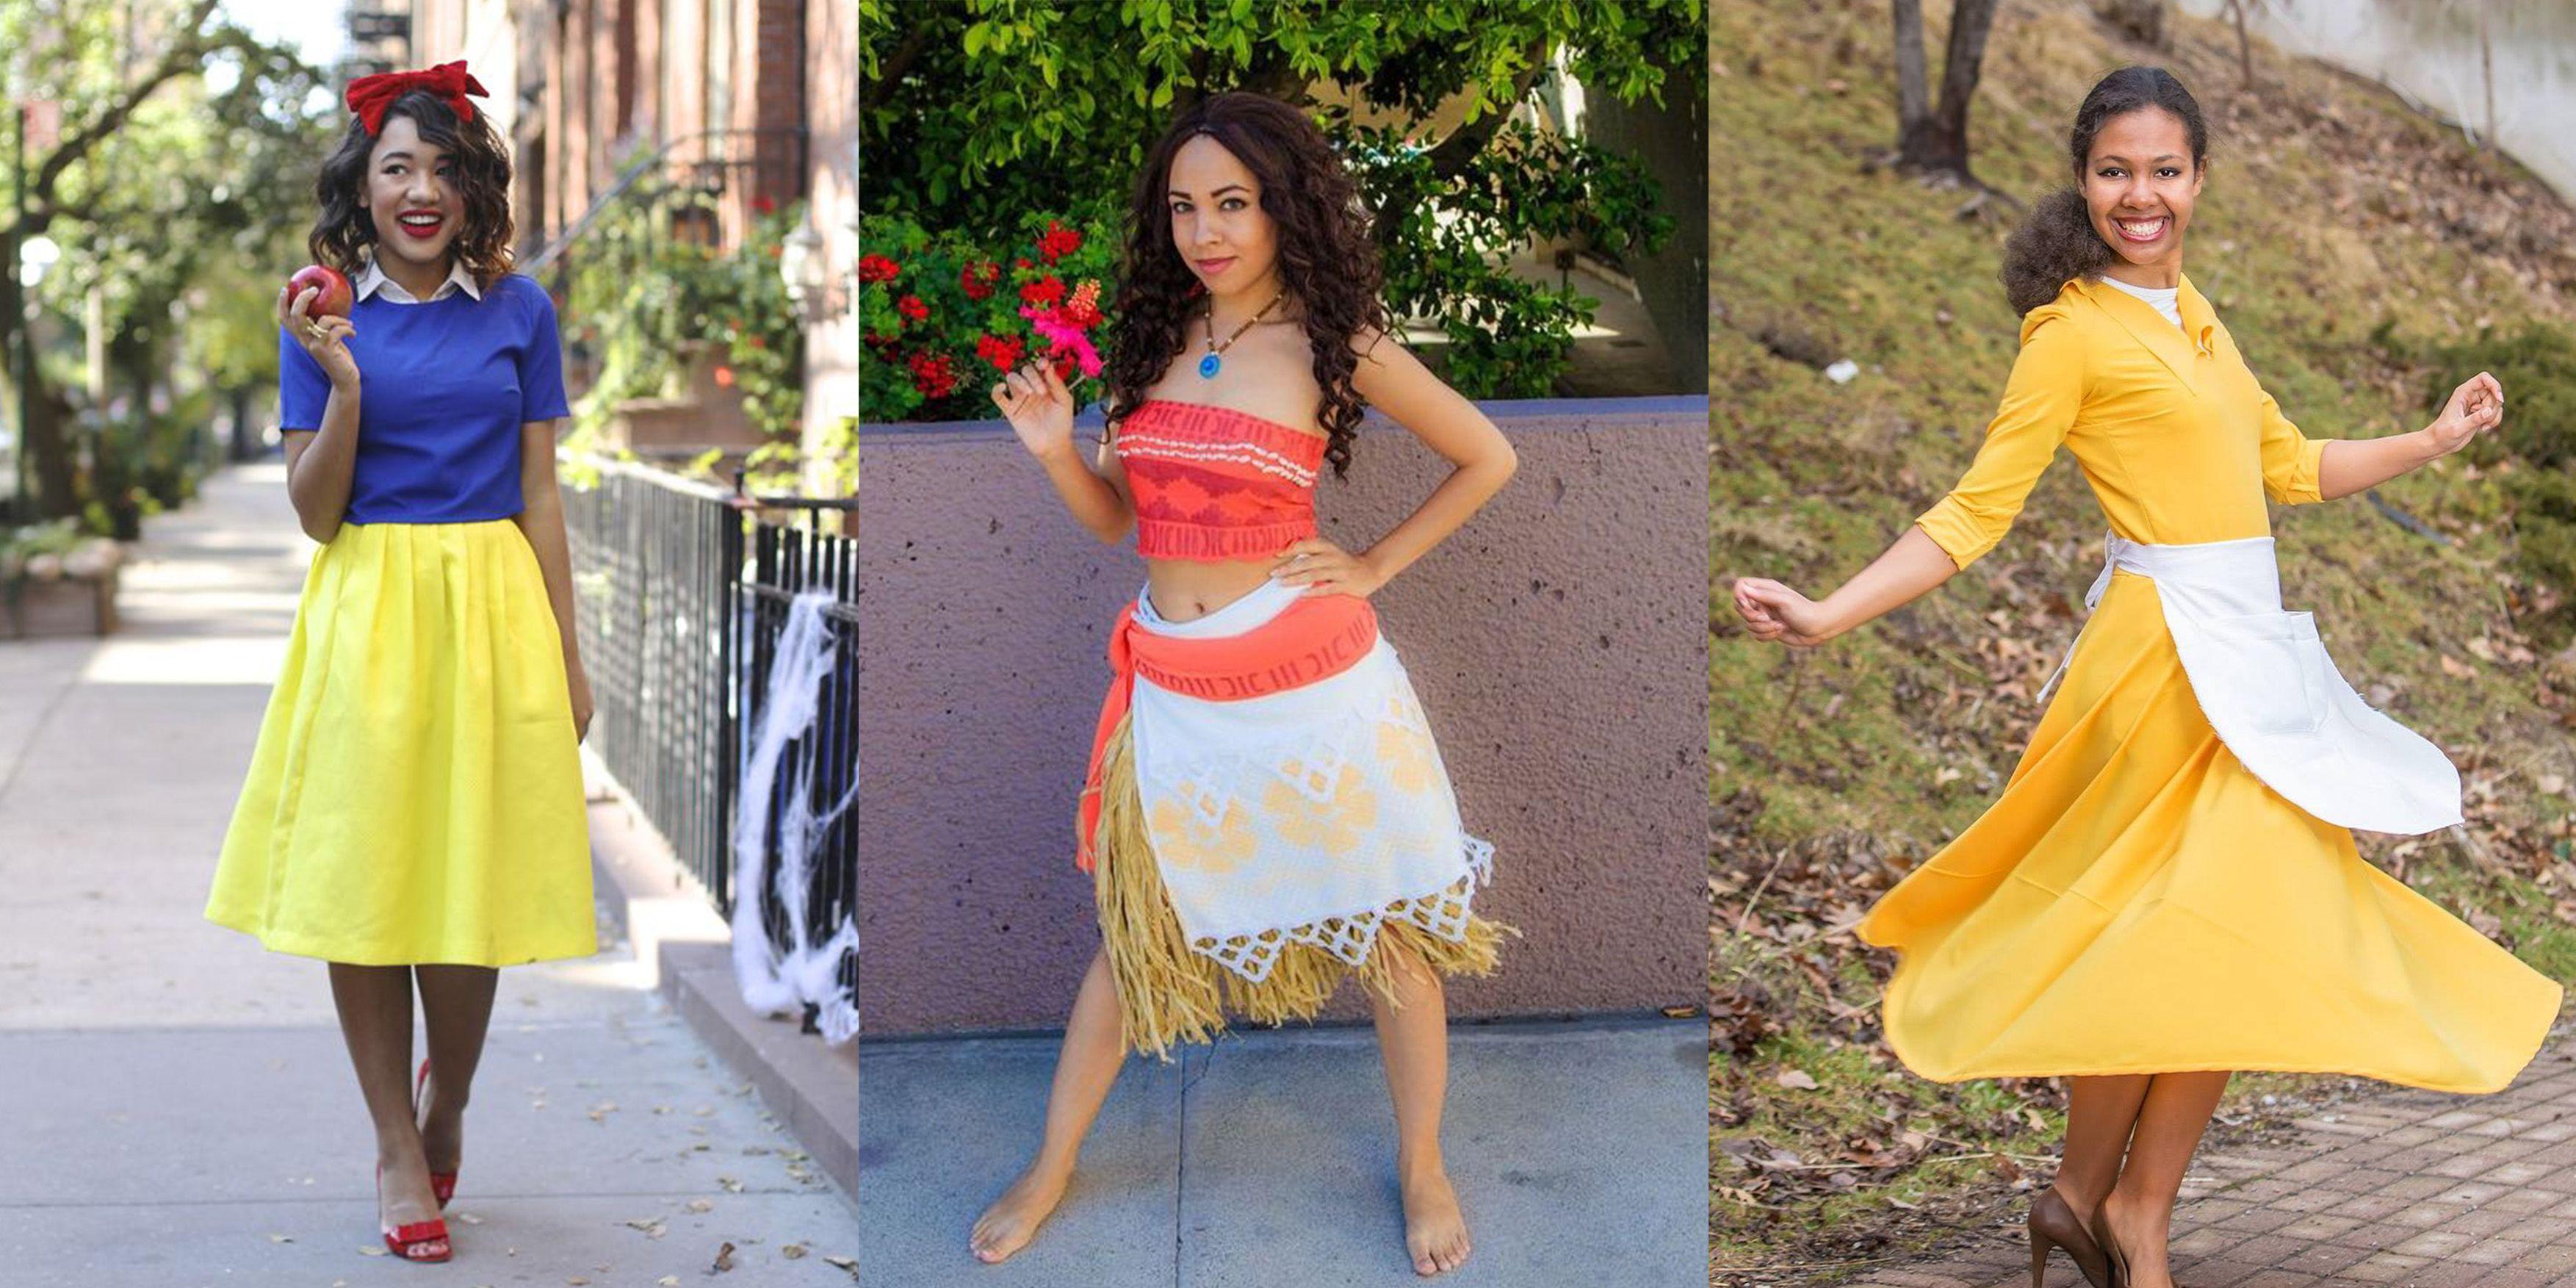 image  sc 1 th 159 & 13 DIY Disney Princess Halloween Costumes - Princess Costume Ideas